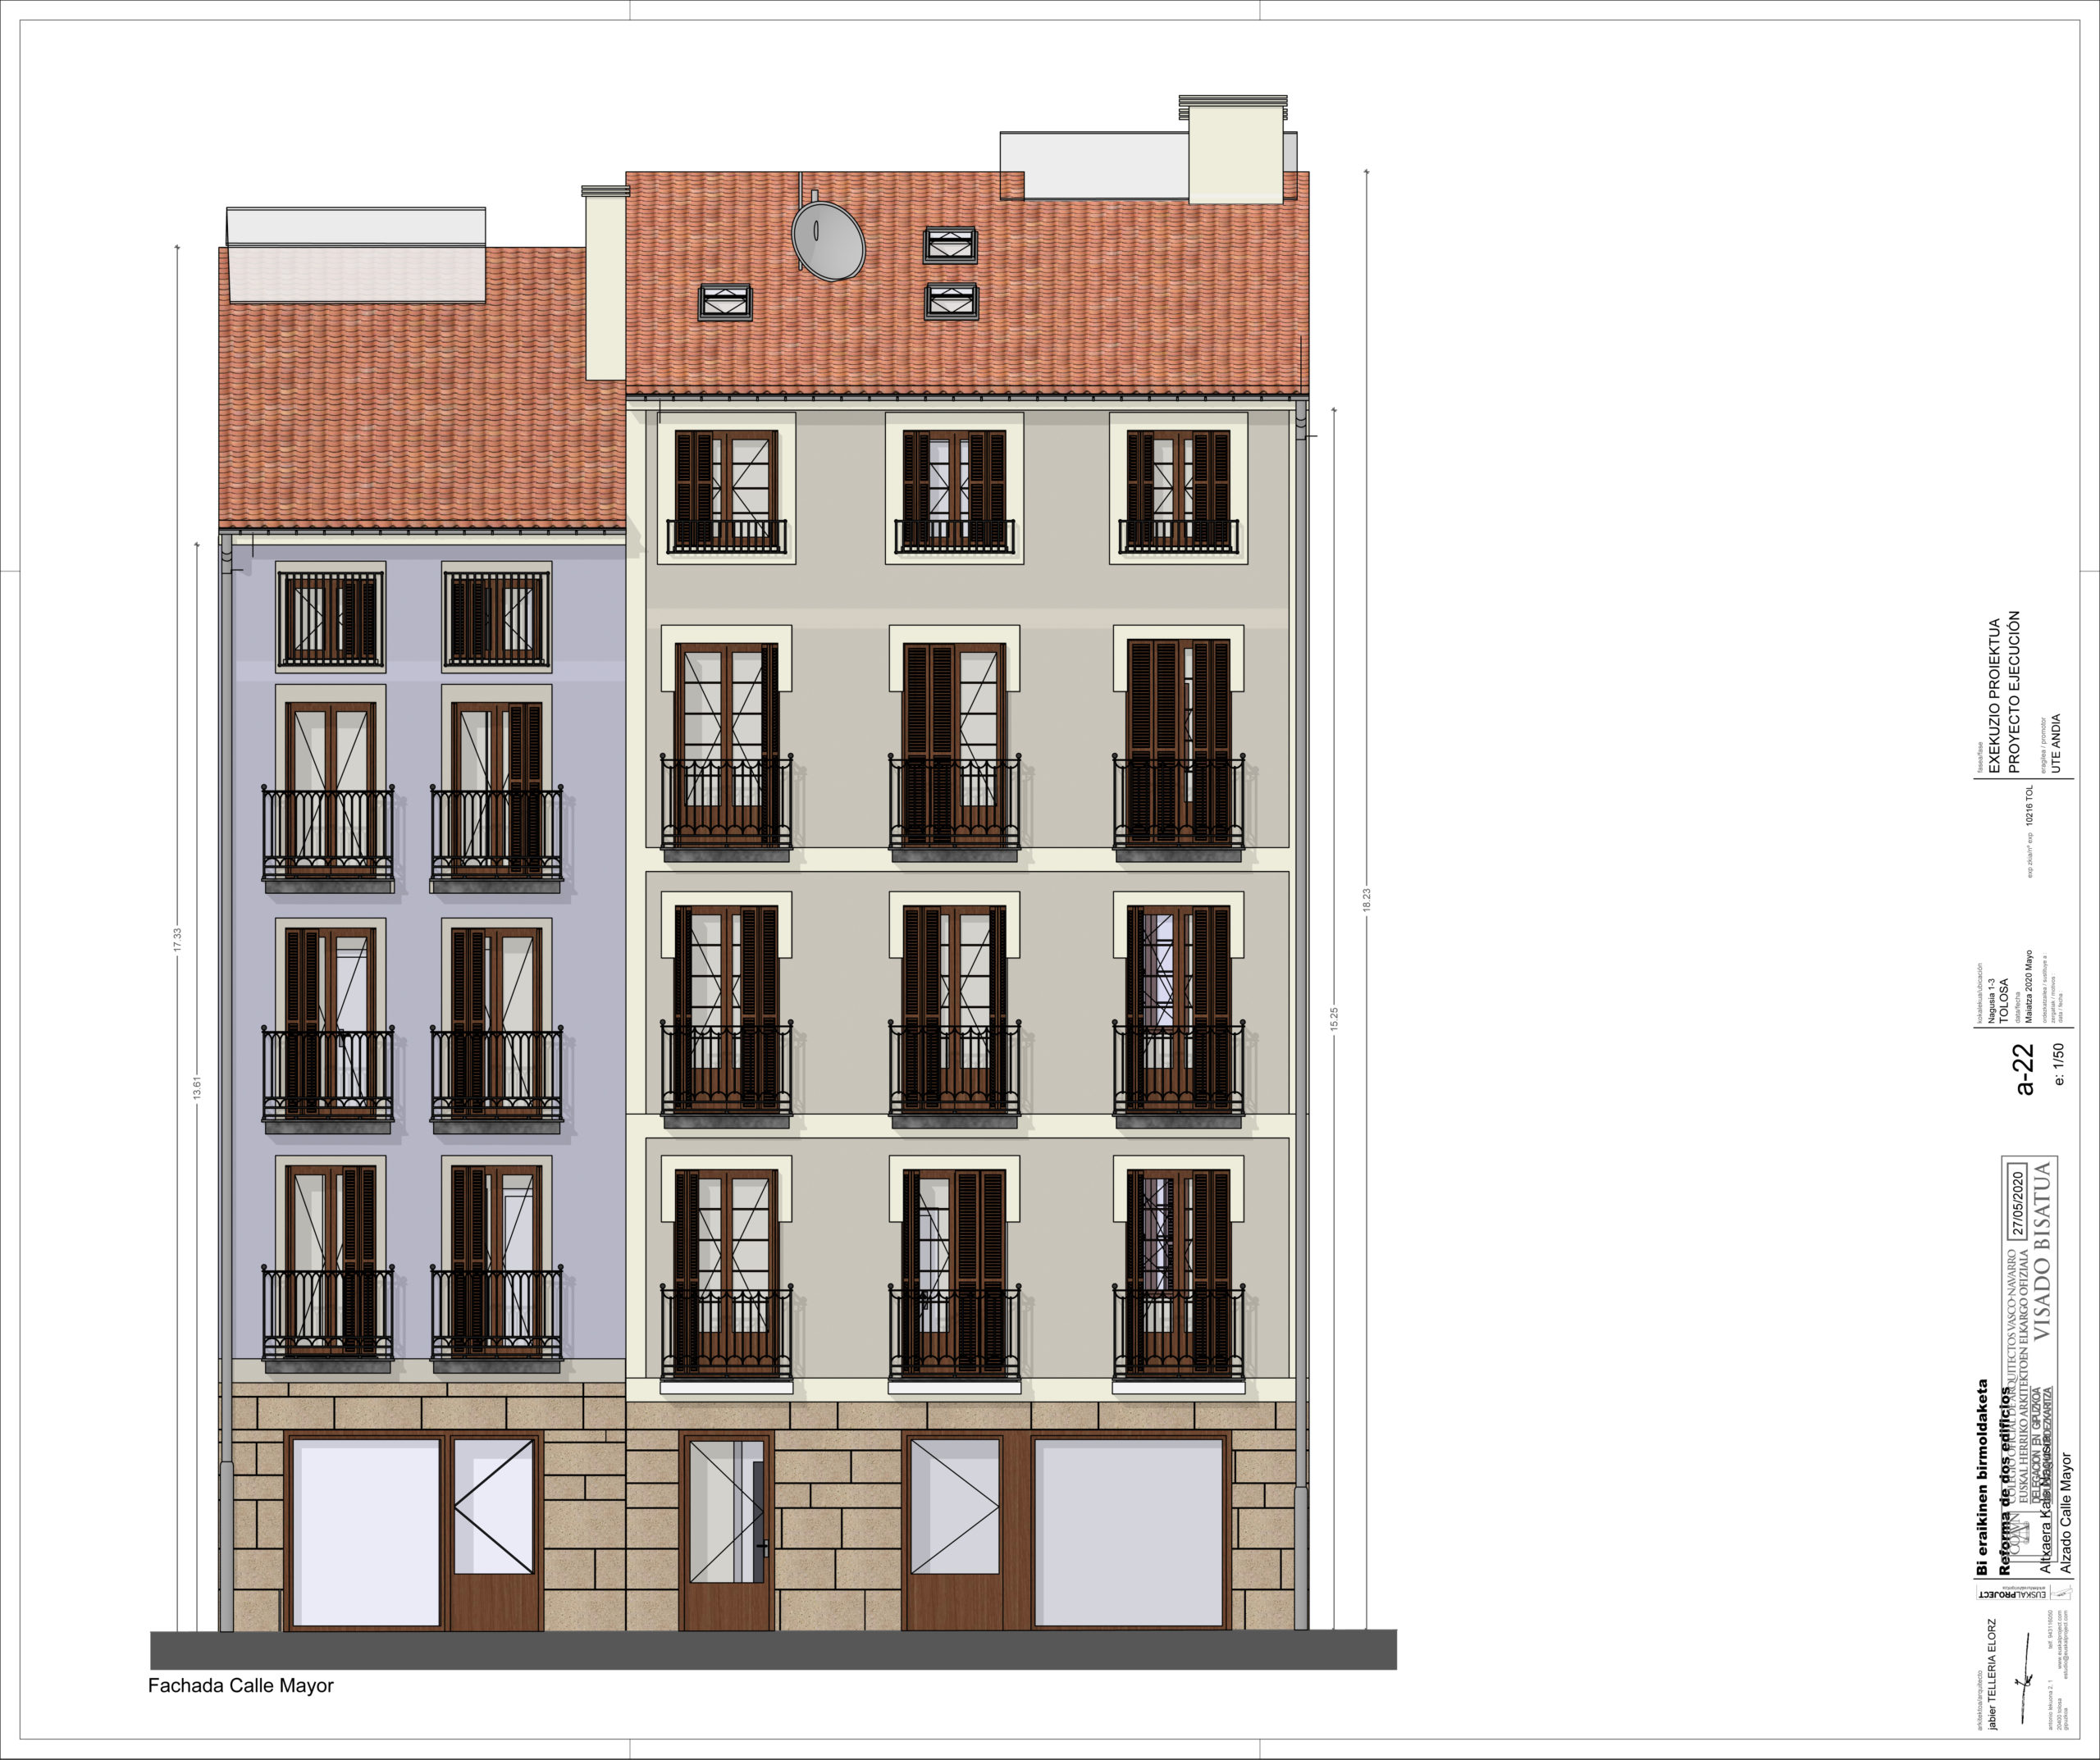 Piso en venta de nueva construcción en Tolosa, Gipuzkoa